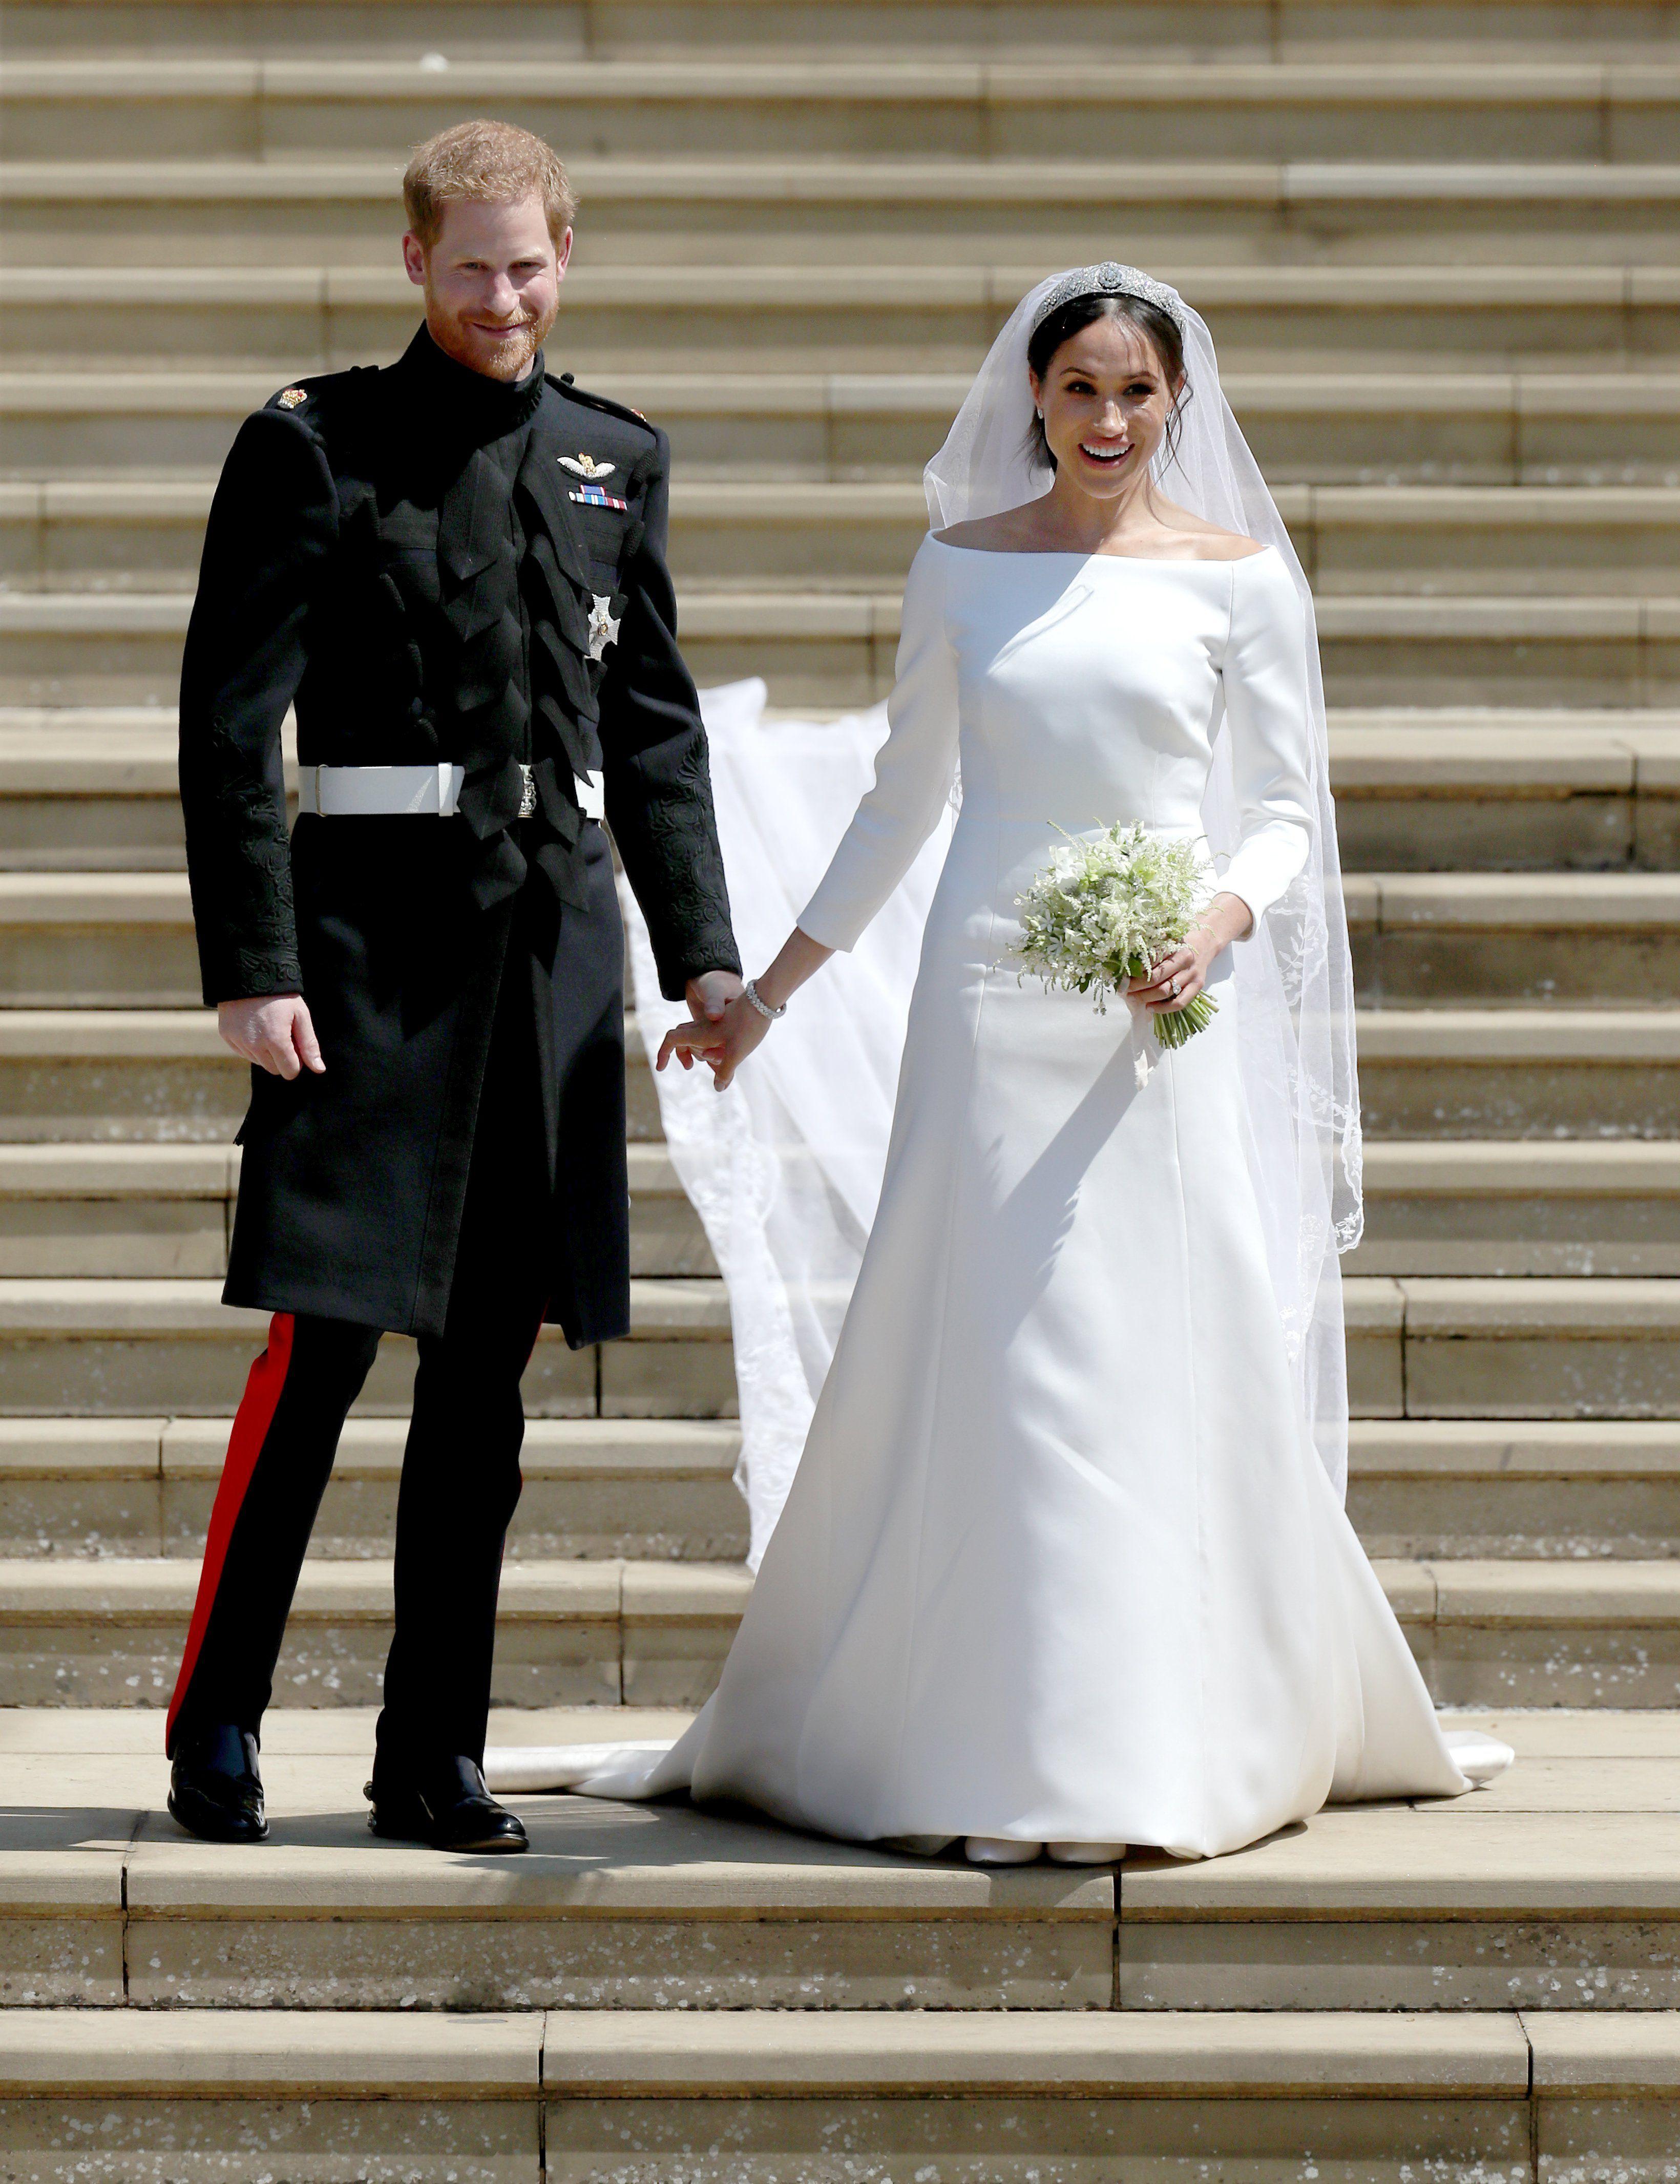 Os Vestidos De Noiva De Meghan Markle E Kim Kardashian Têm